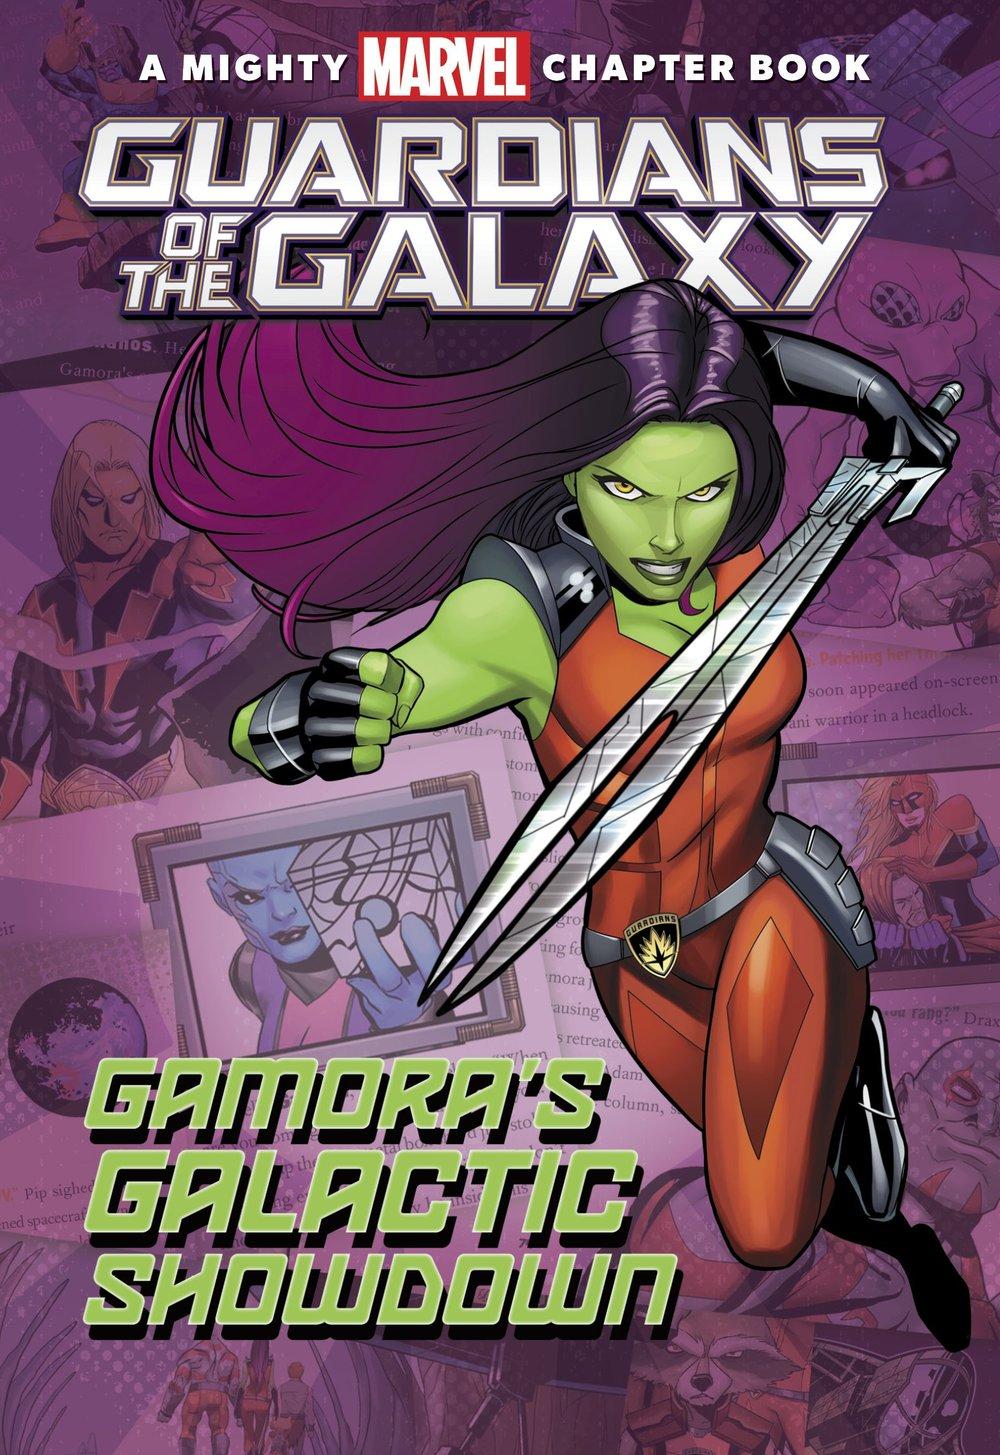 Gamora: Galactic Showdown